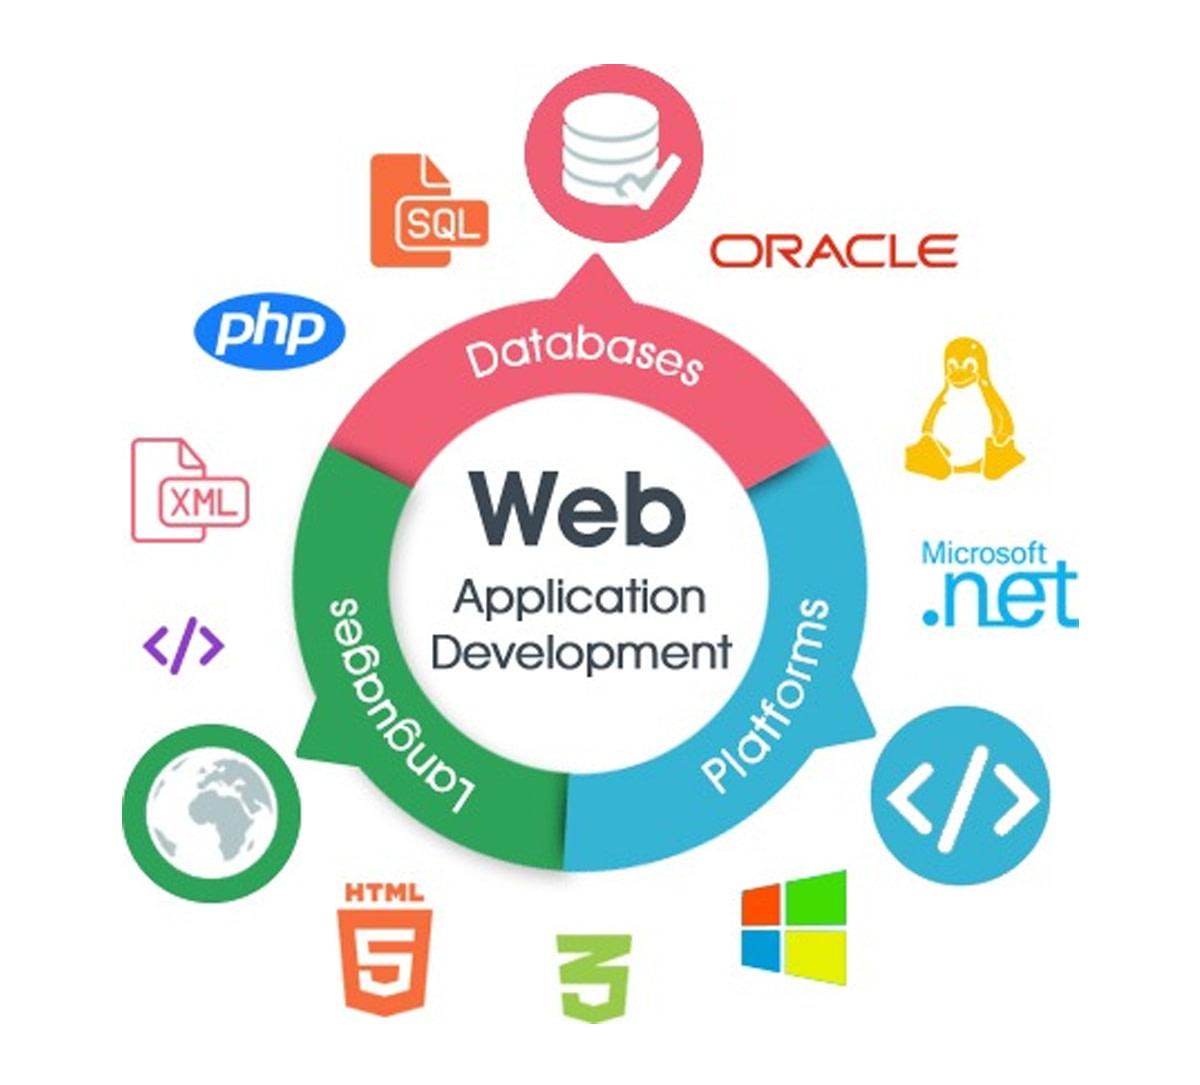 https://ml8bxbbz7pj9.i.optimole.com/kcjfi9Q.mVbO~6367f/w:auto/h:auto/q:90/https://arksstech.com/wp-content/upload/2018/06/web-development-application-1.png